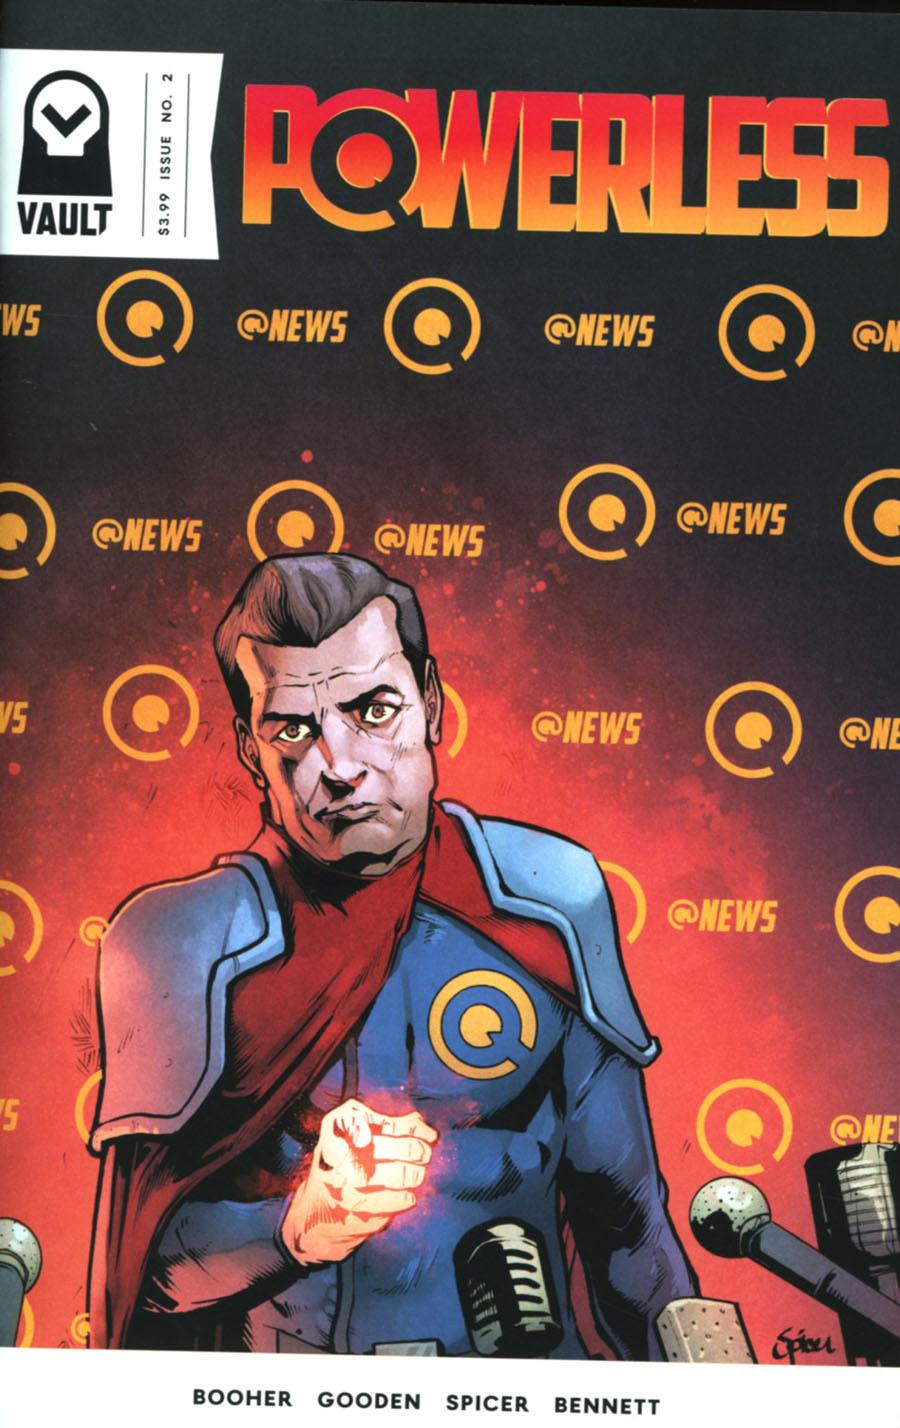 Powerless (Vault Comics) #2